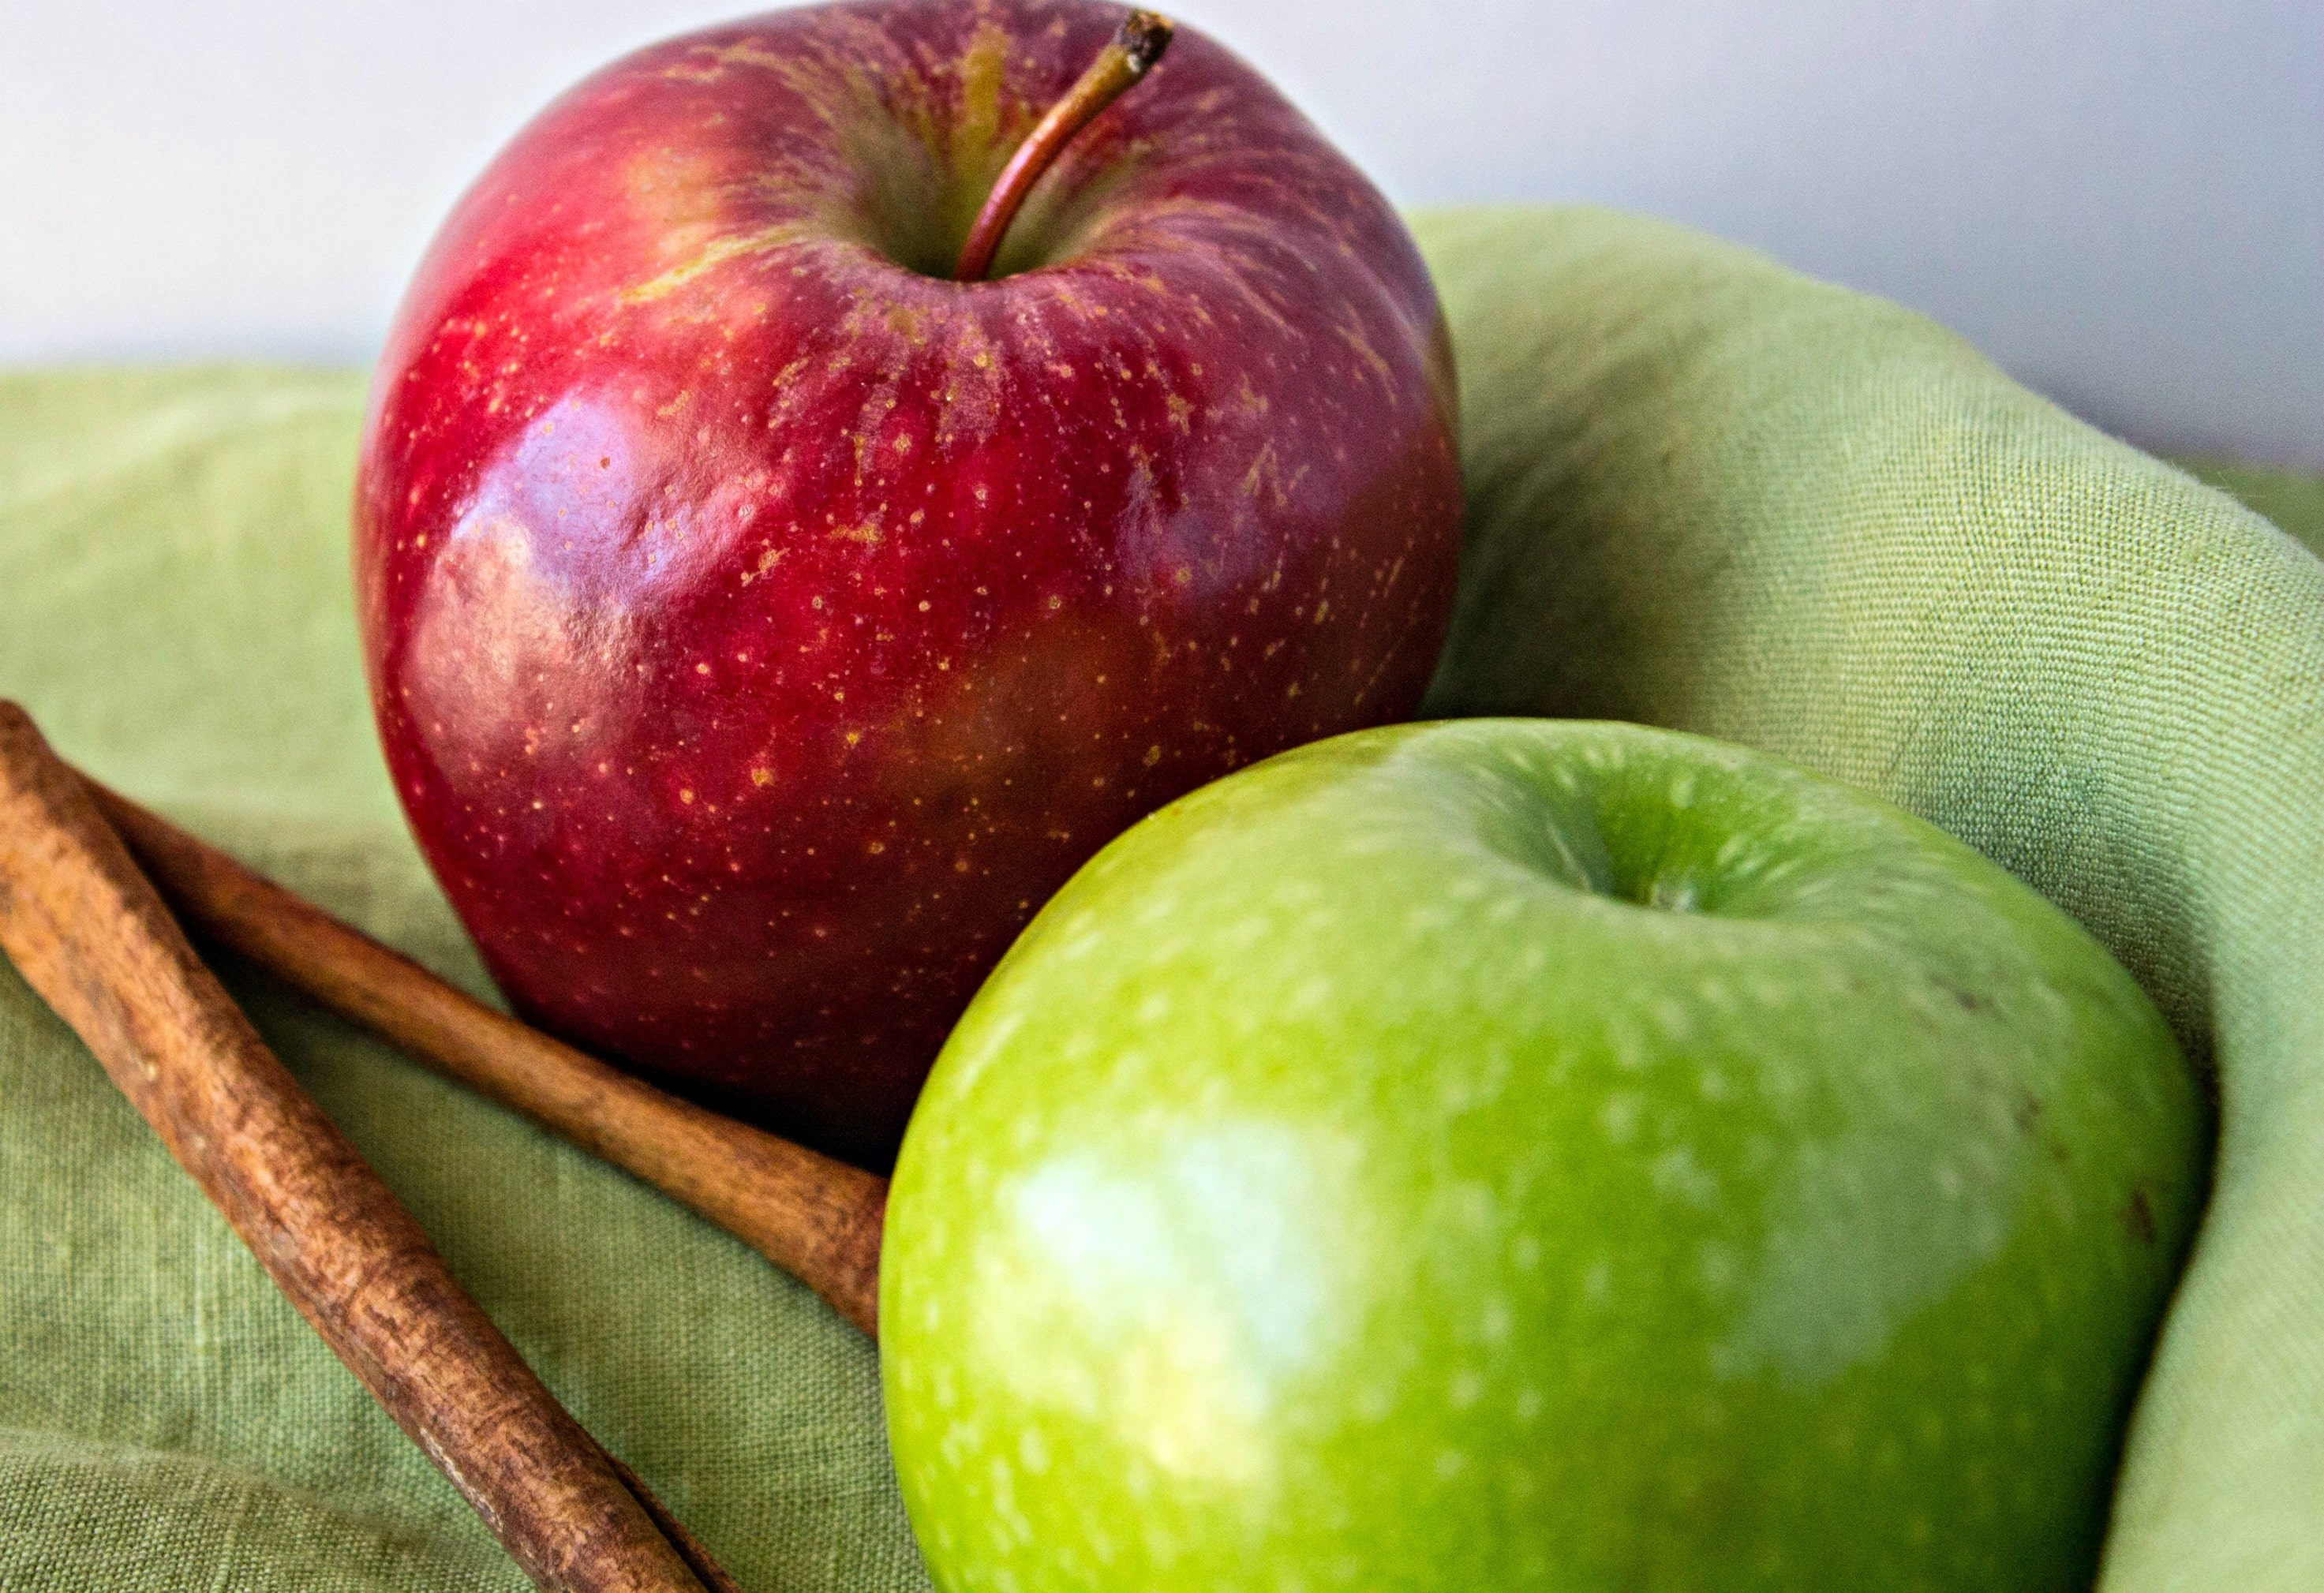 Apples And Cinnamon Sticks